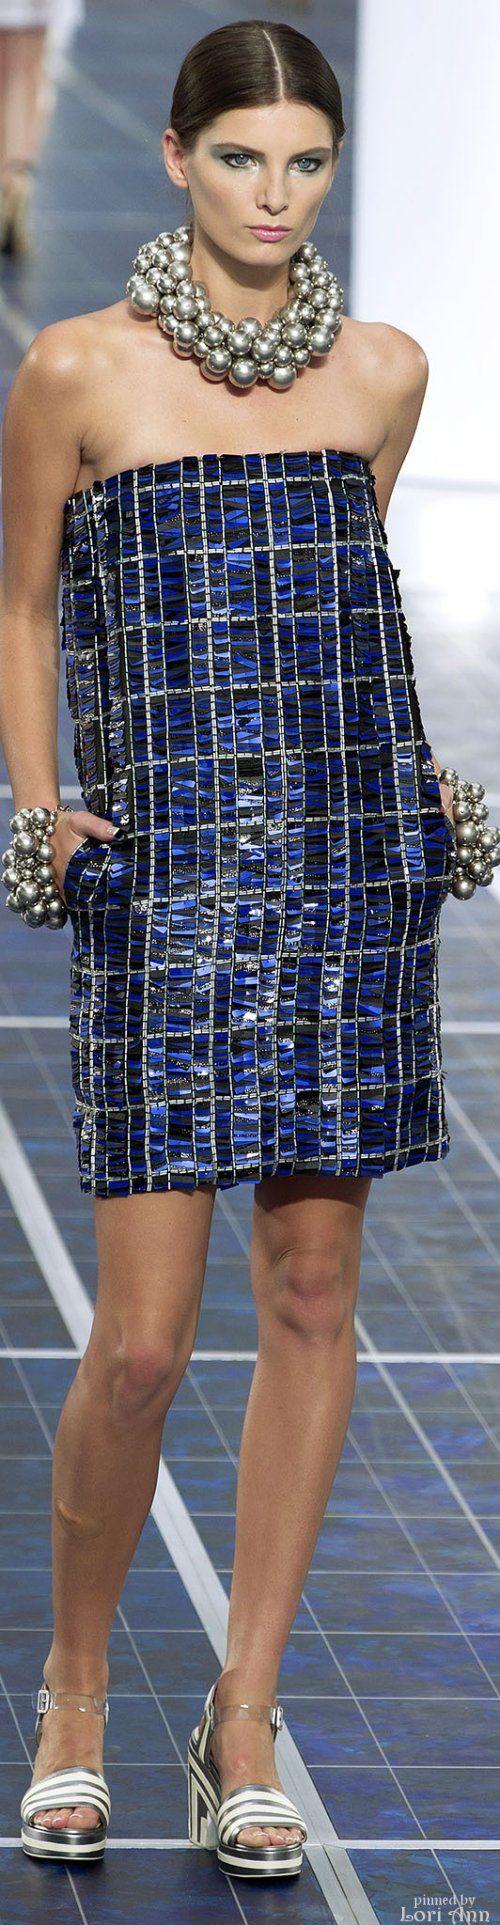 Chanel ~ Strapless Mini Dress, Navy